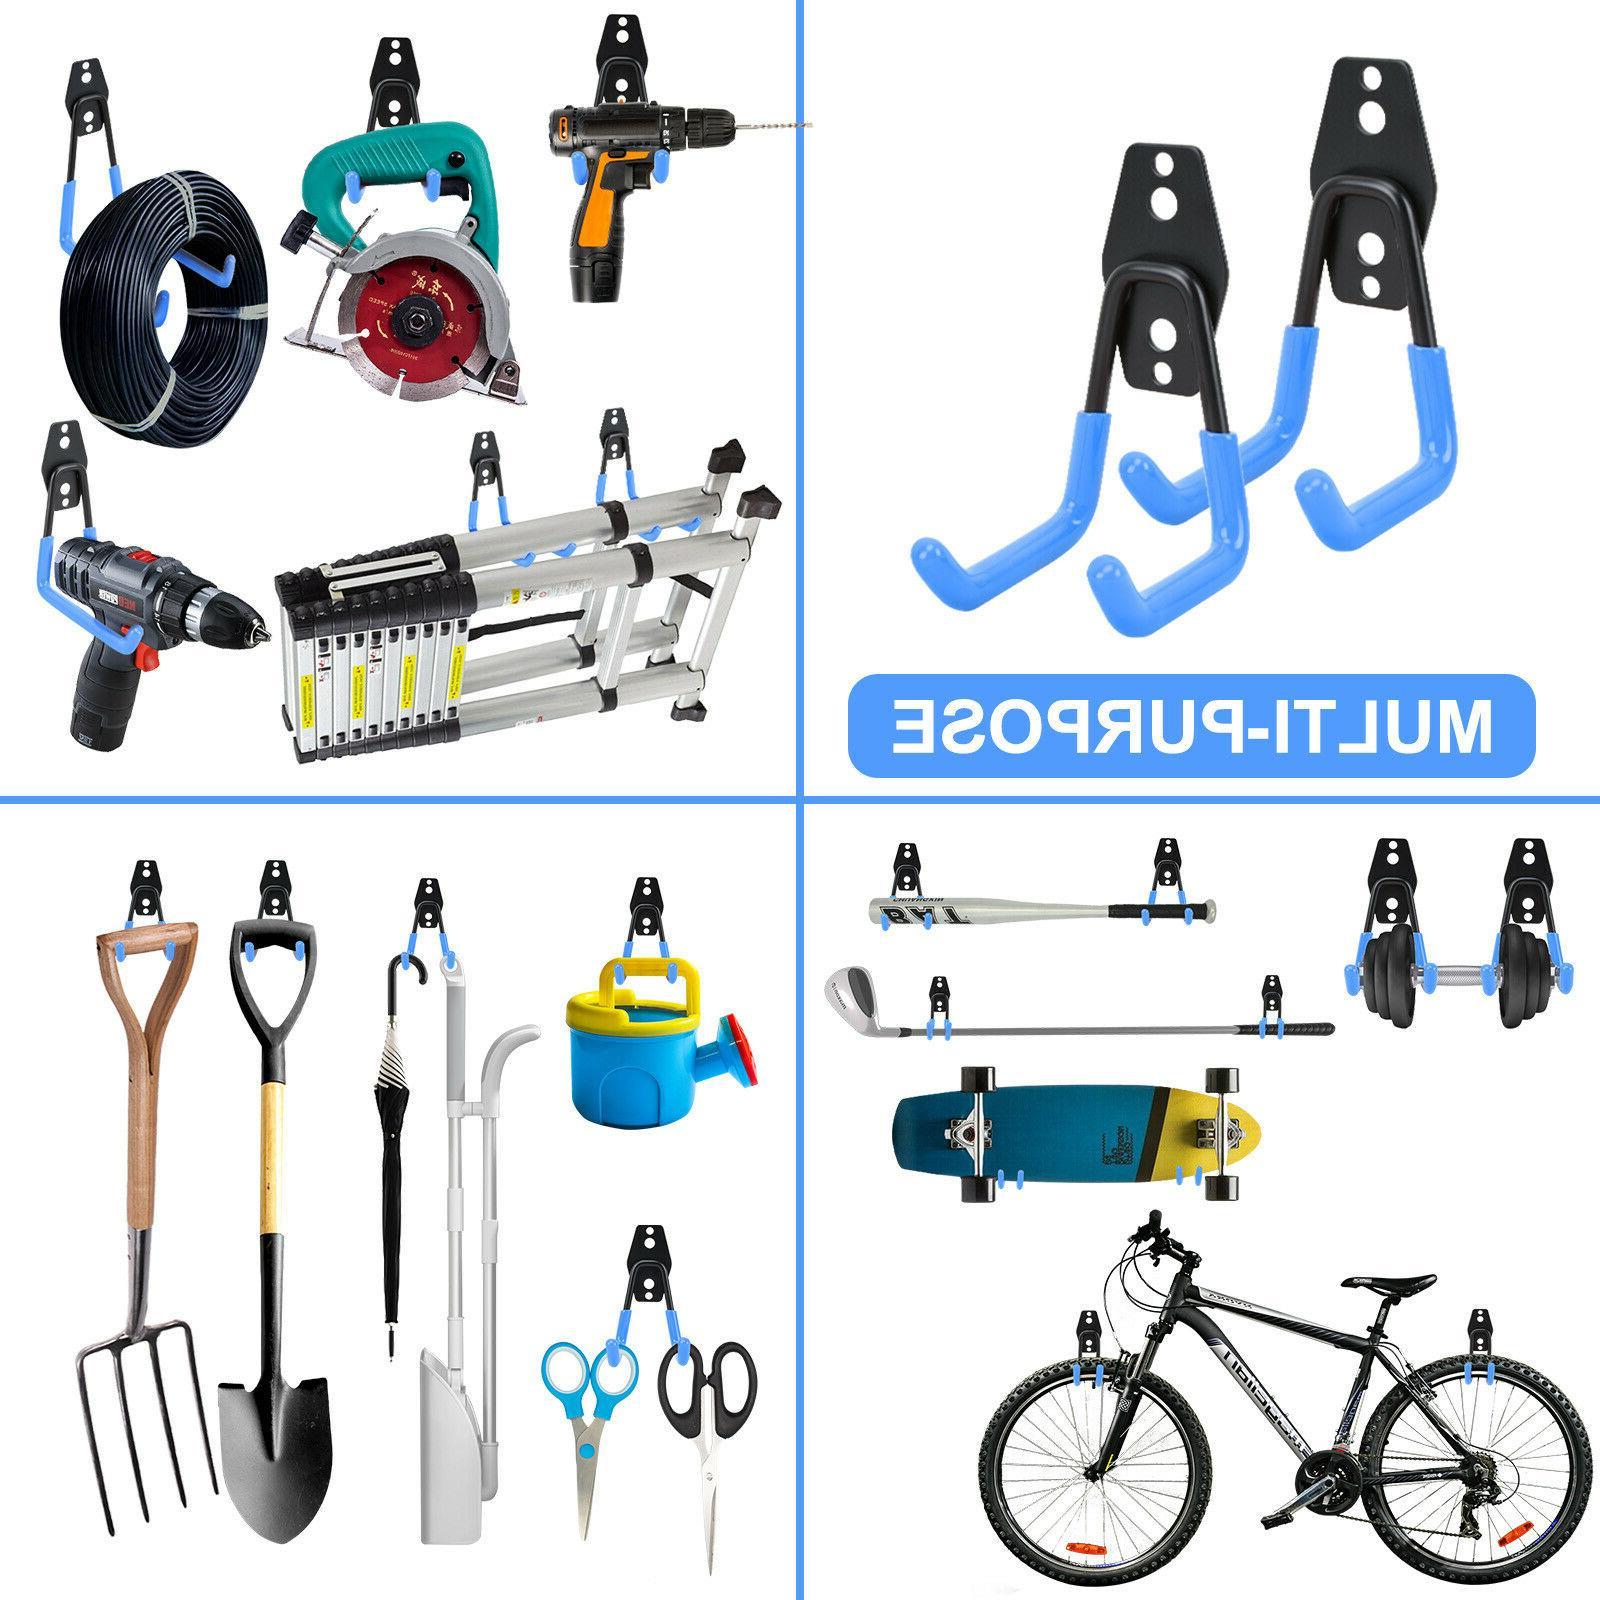 12 Storage Hooks Tool for Tools, Bikes